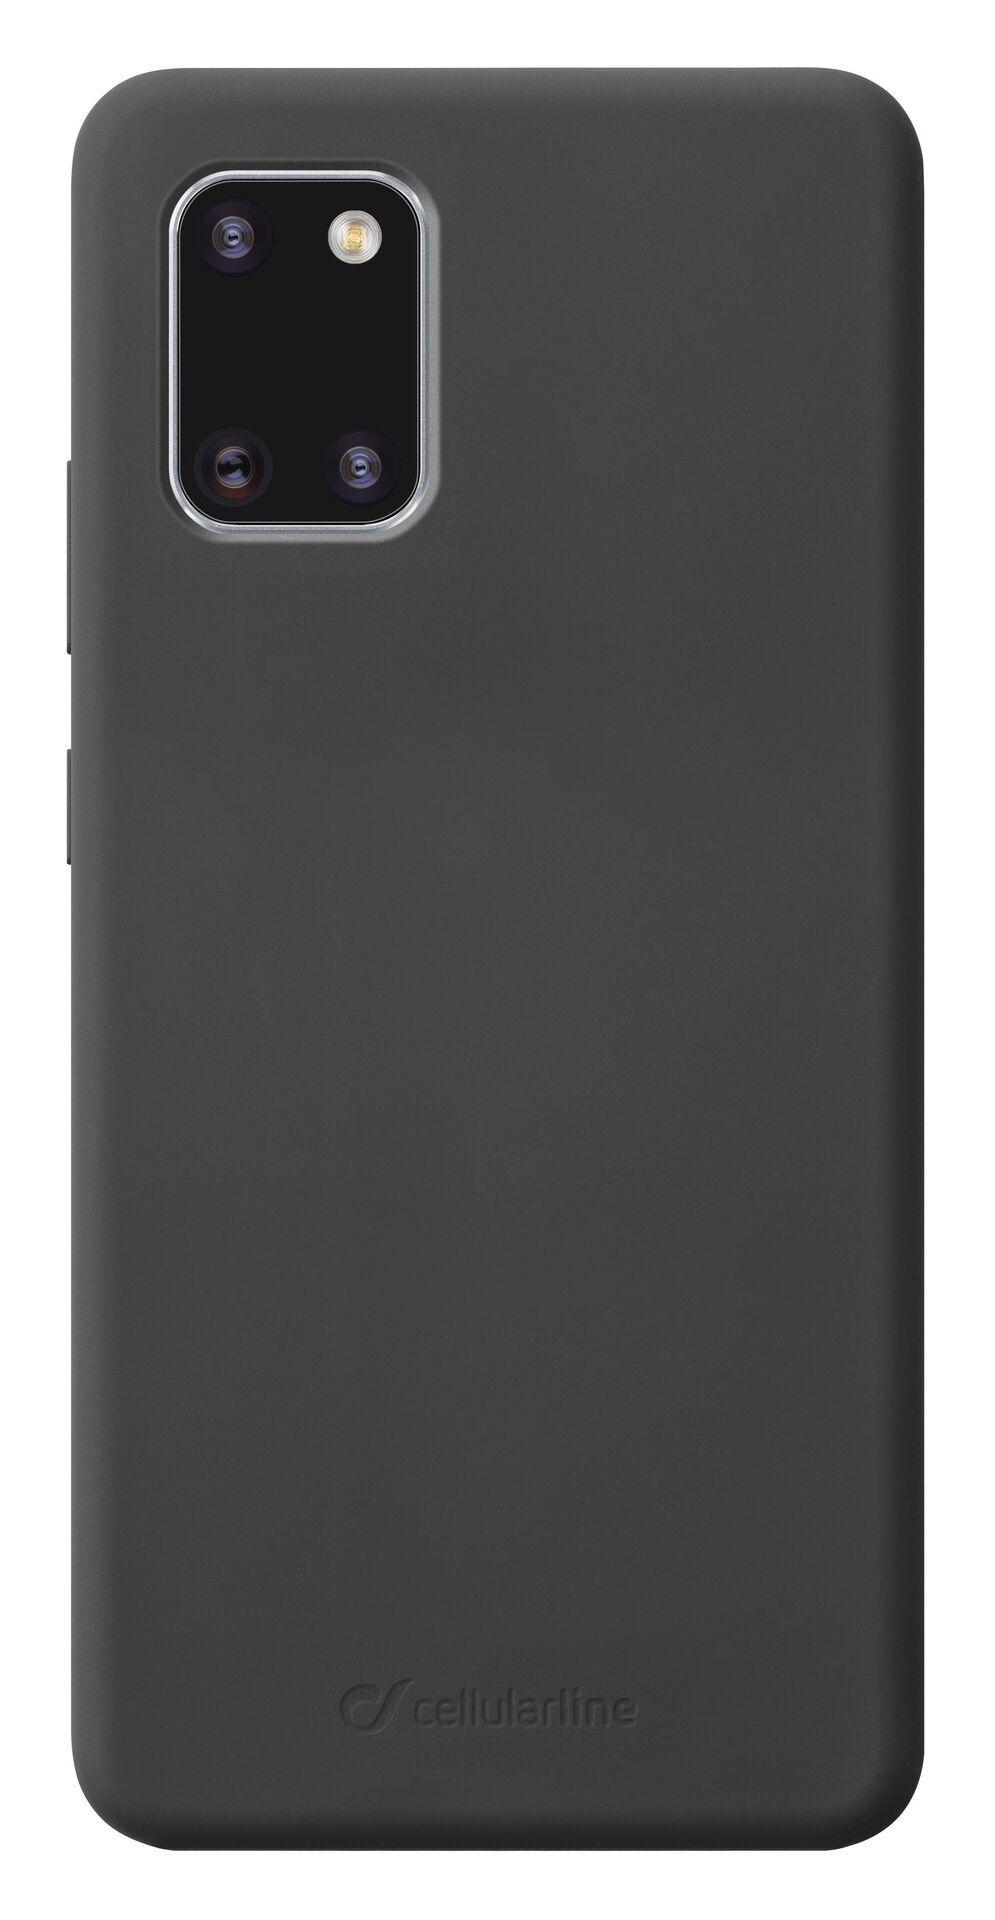 Калъф за Samsung Galaxy S10 Lite Cellularline - Sensation, черен - 1